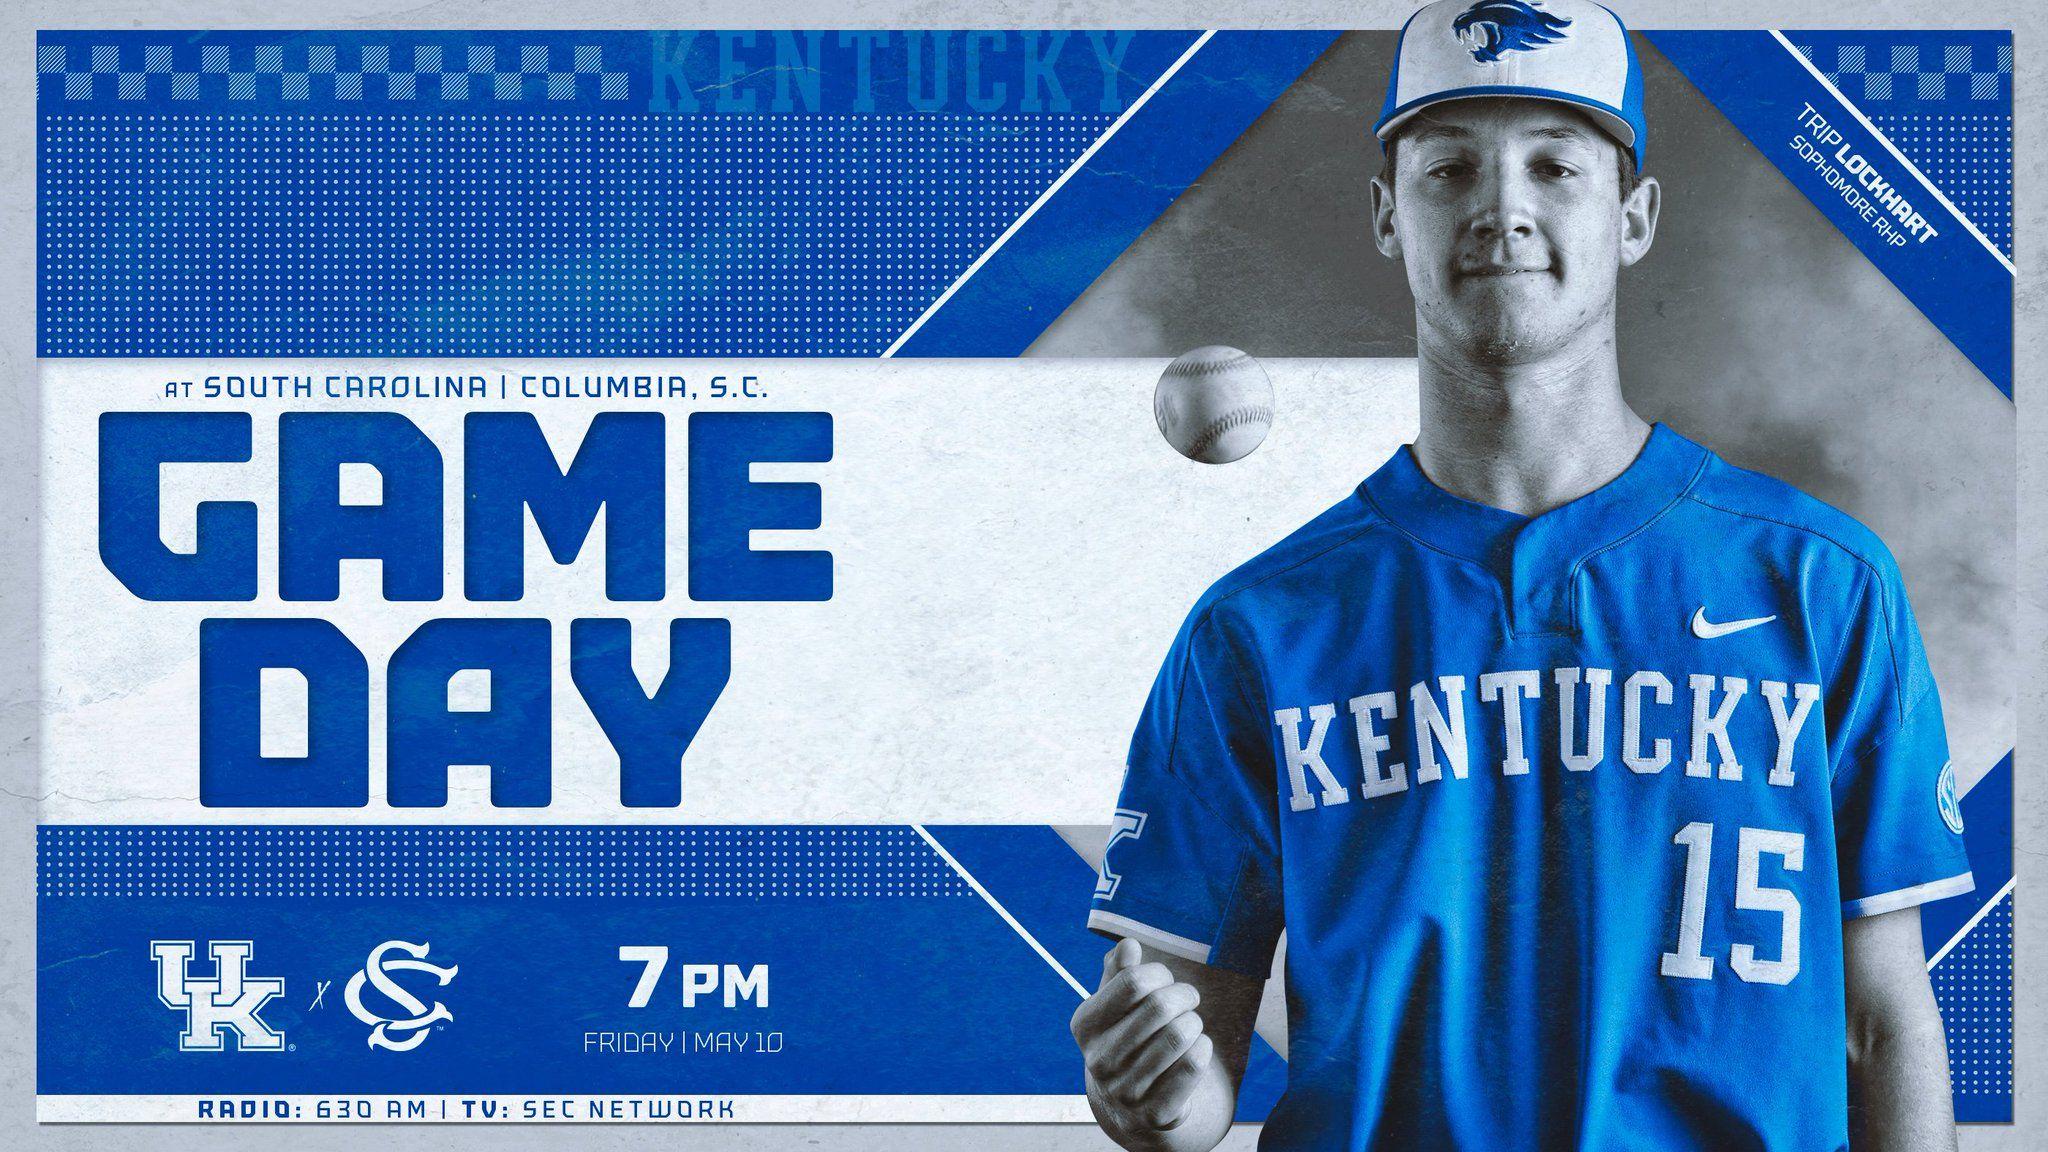 Kentucky Baseball On In 2020 Kentucky Sec Network Baseball